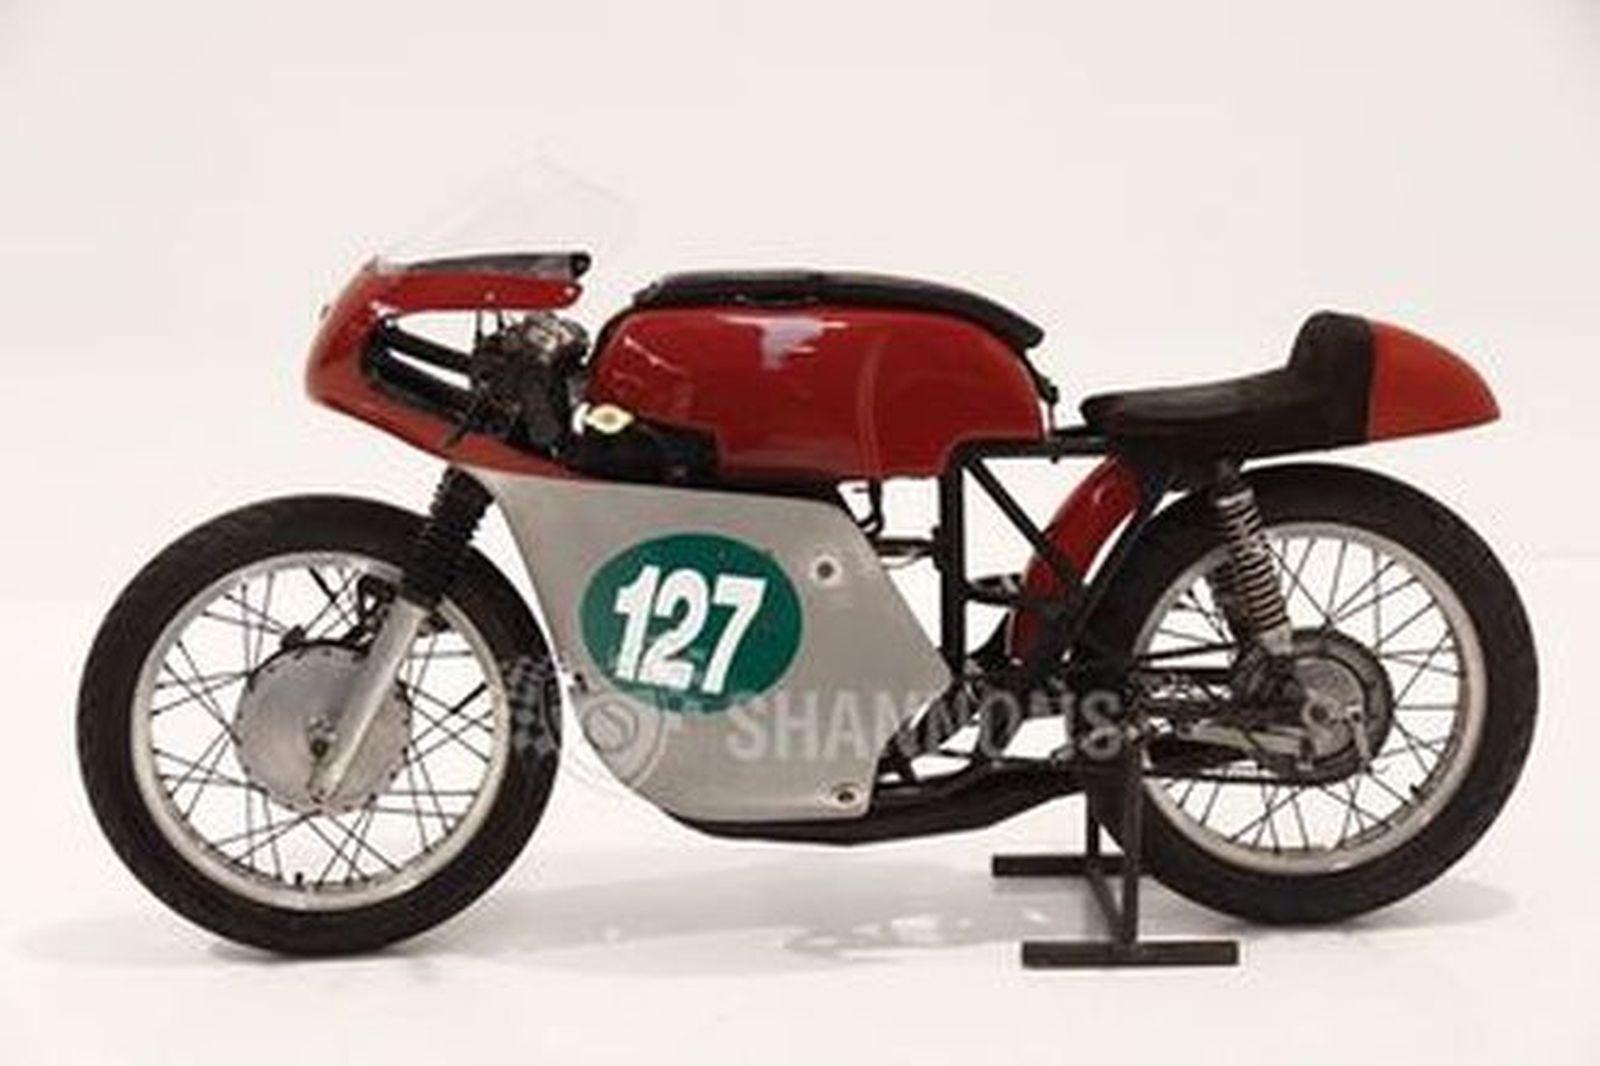 Bultaco TSS 250cc Race Motorcycle Auctions - Lot 11 - Shannons